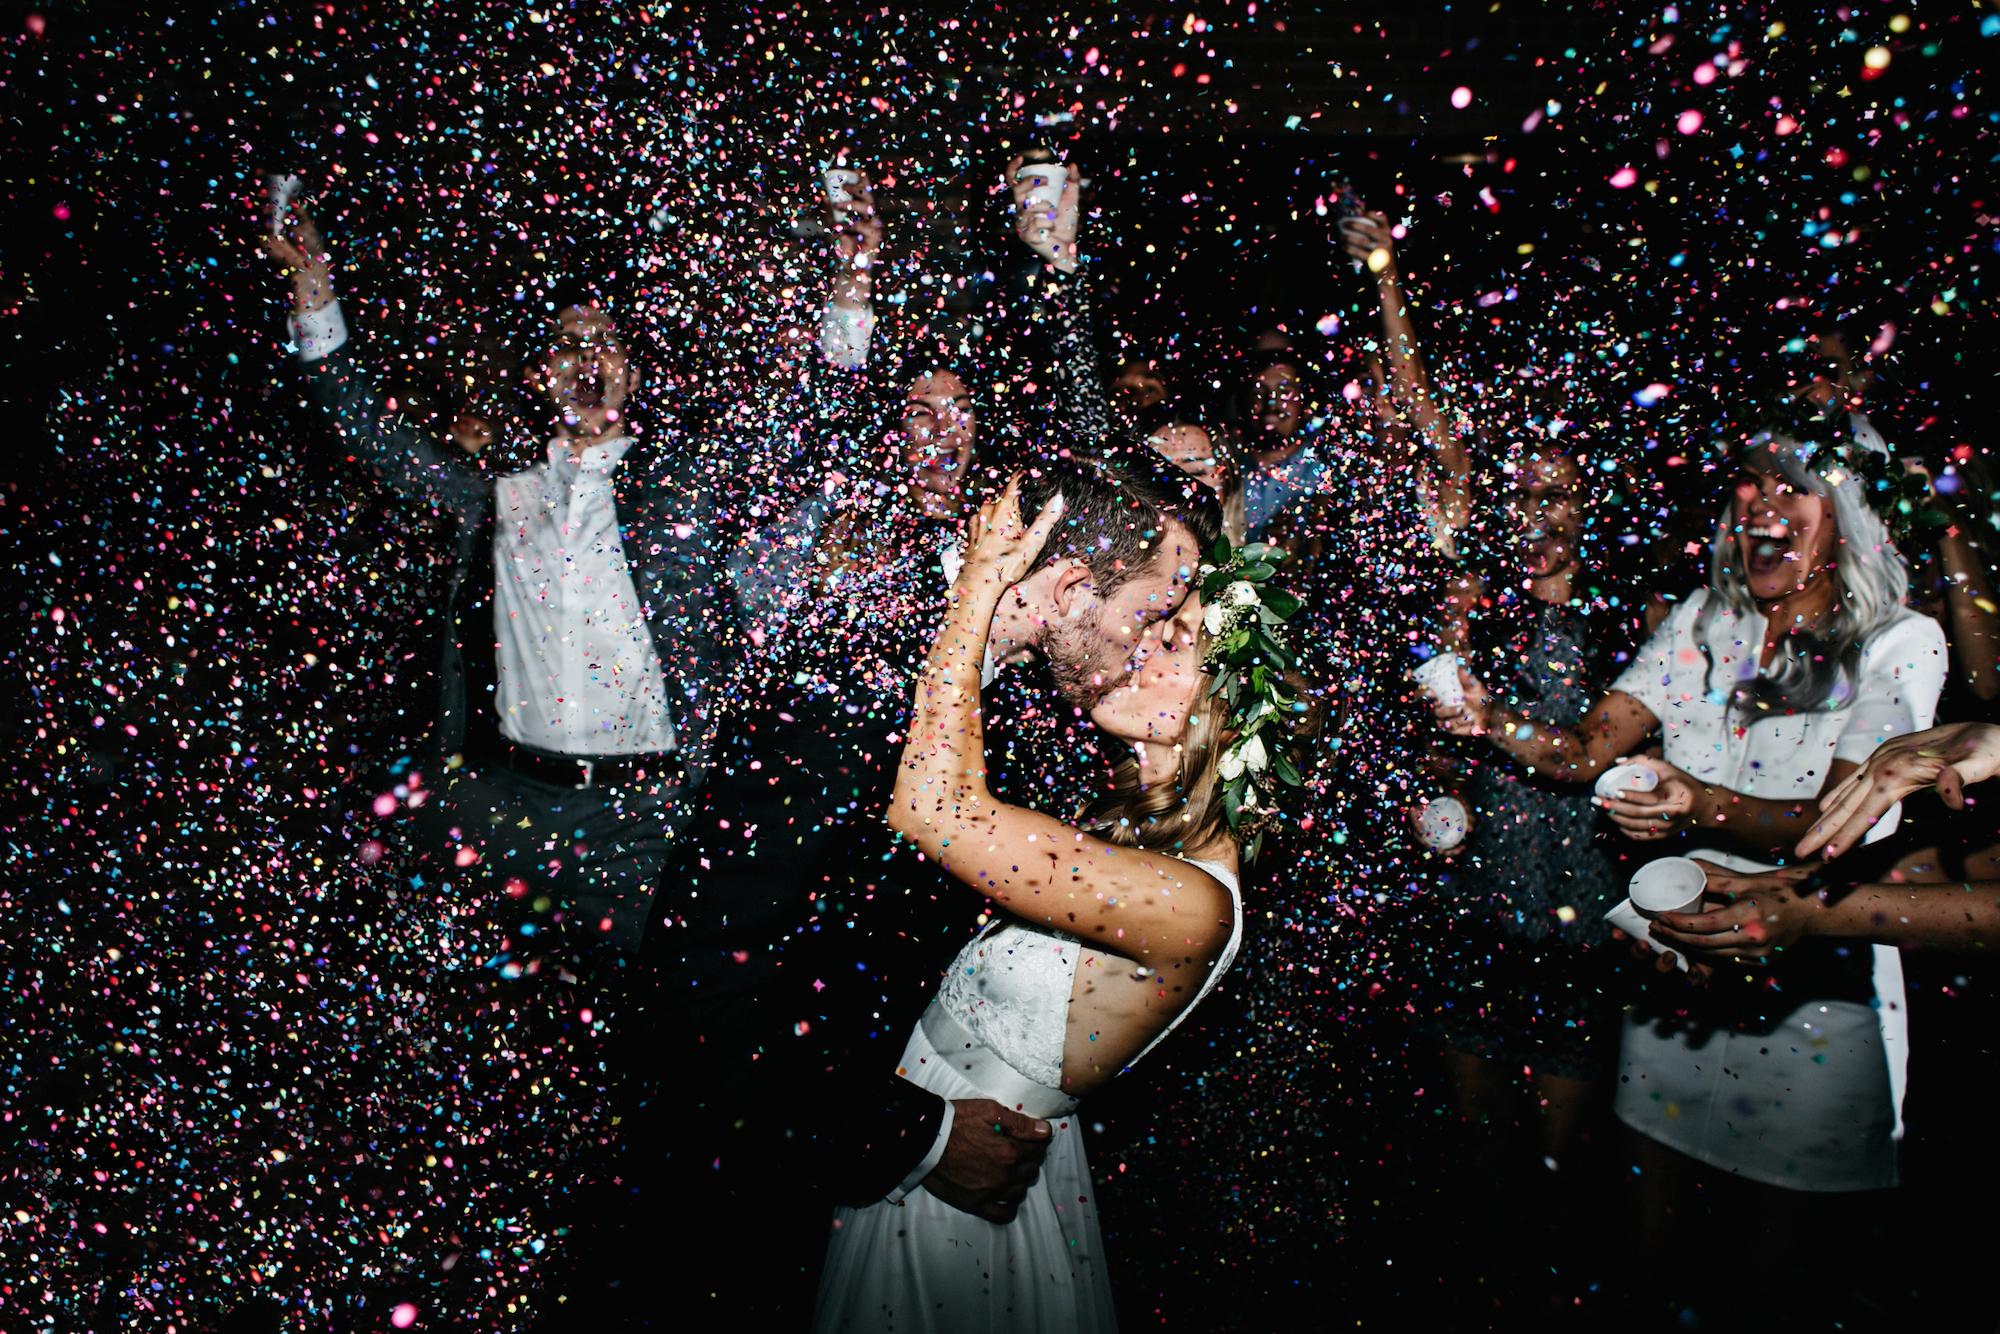 arizona - wedding - photographer 600.jpg